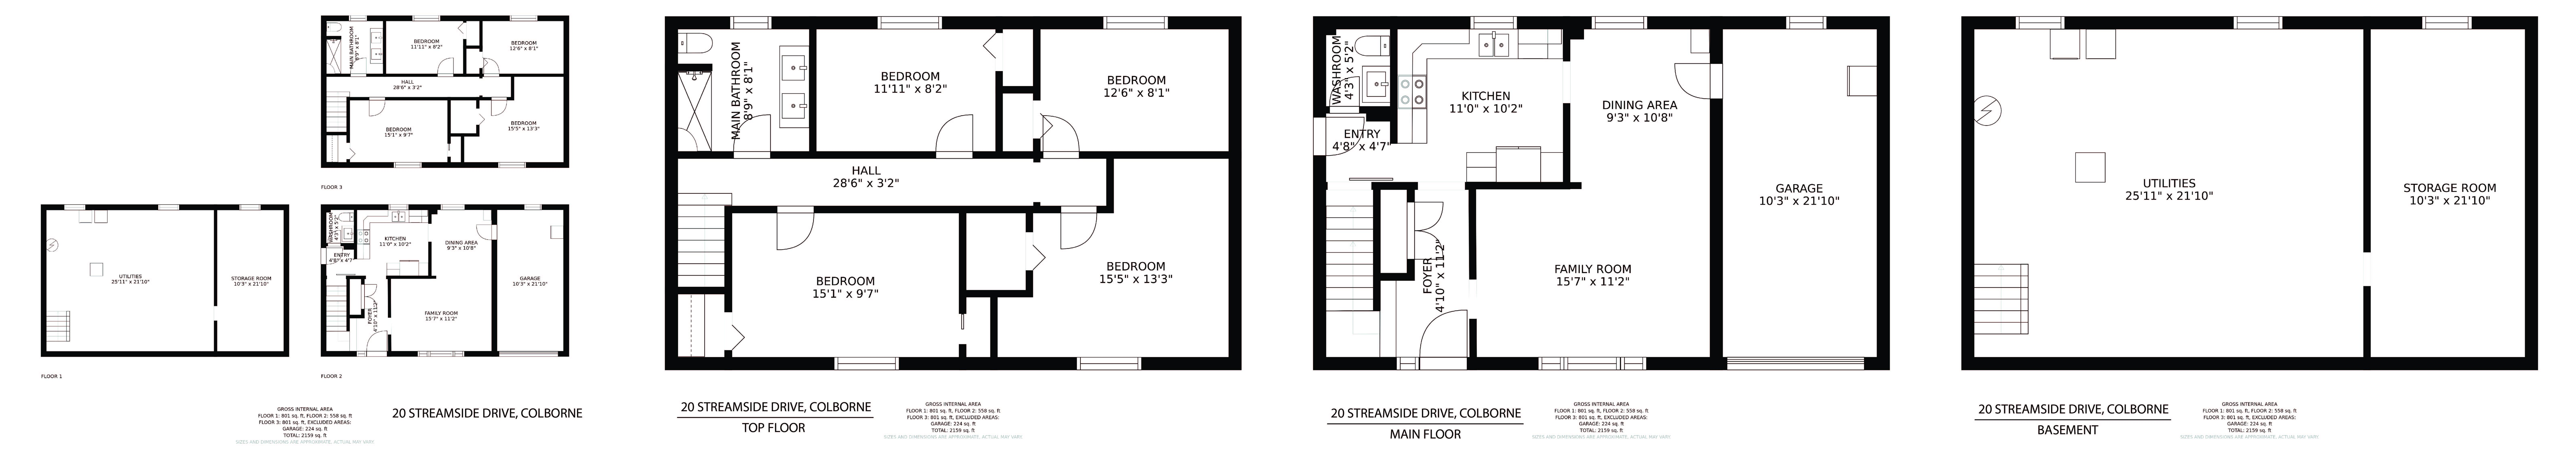 20 Streamside Drive floorplan